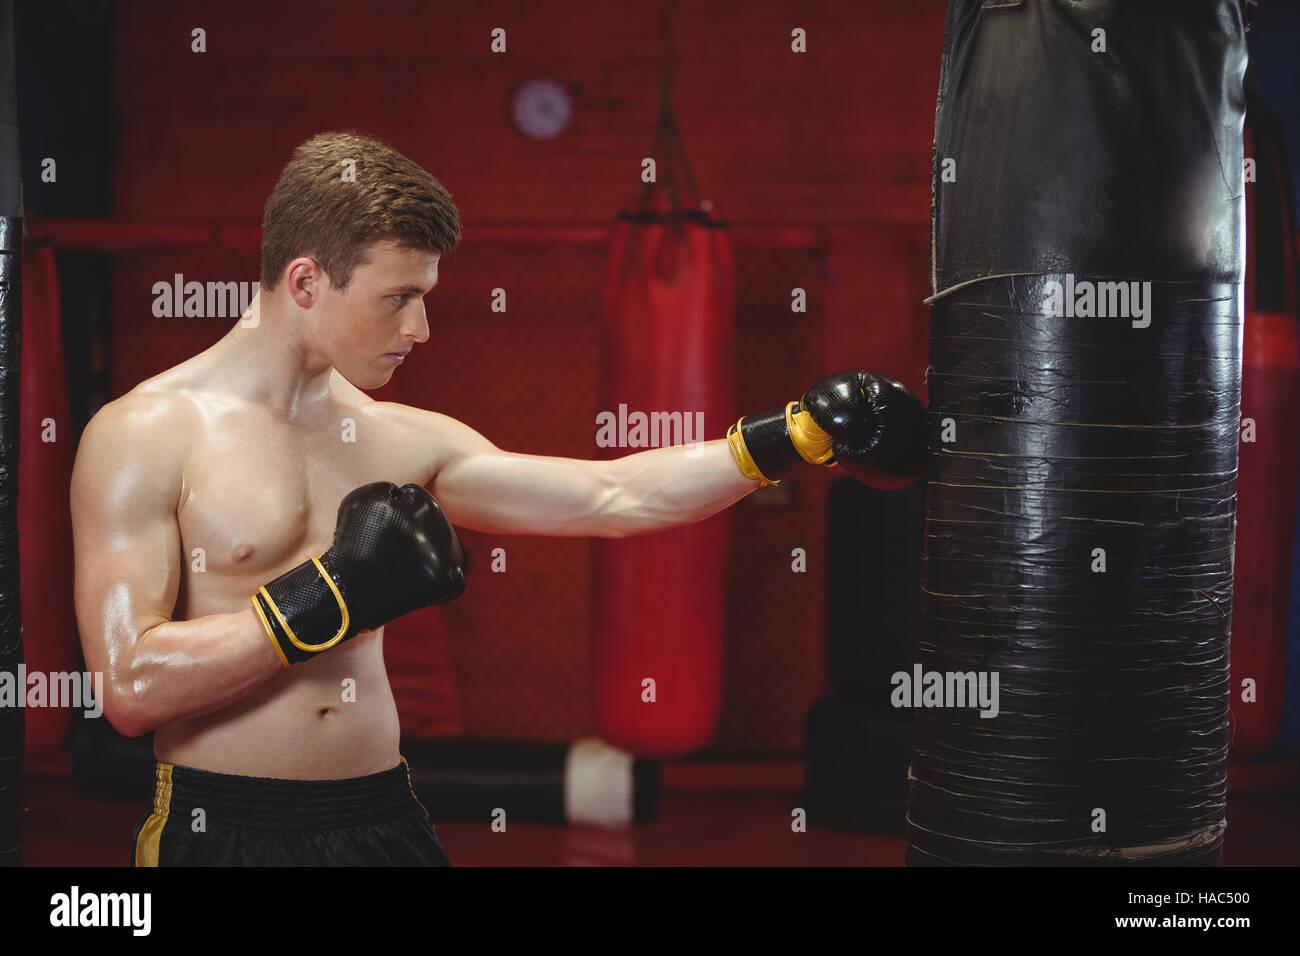 Boxer punching a boxing bag - Stock Image